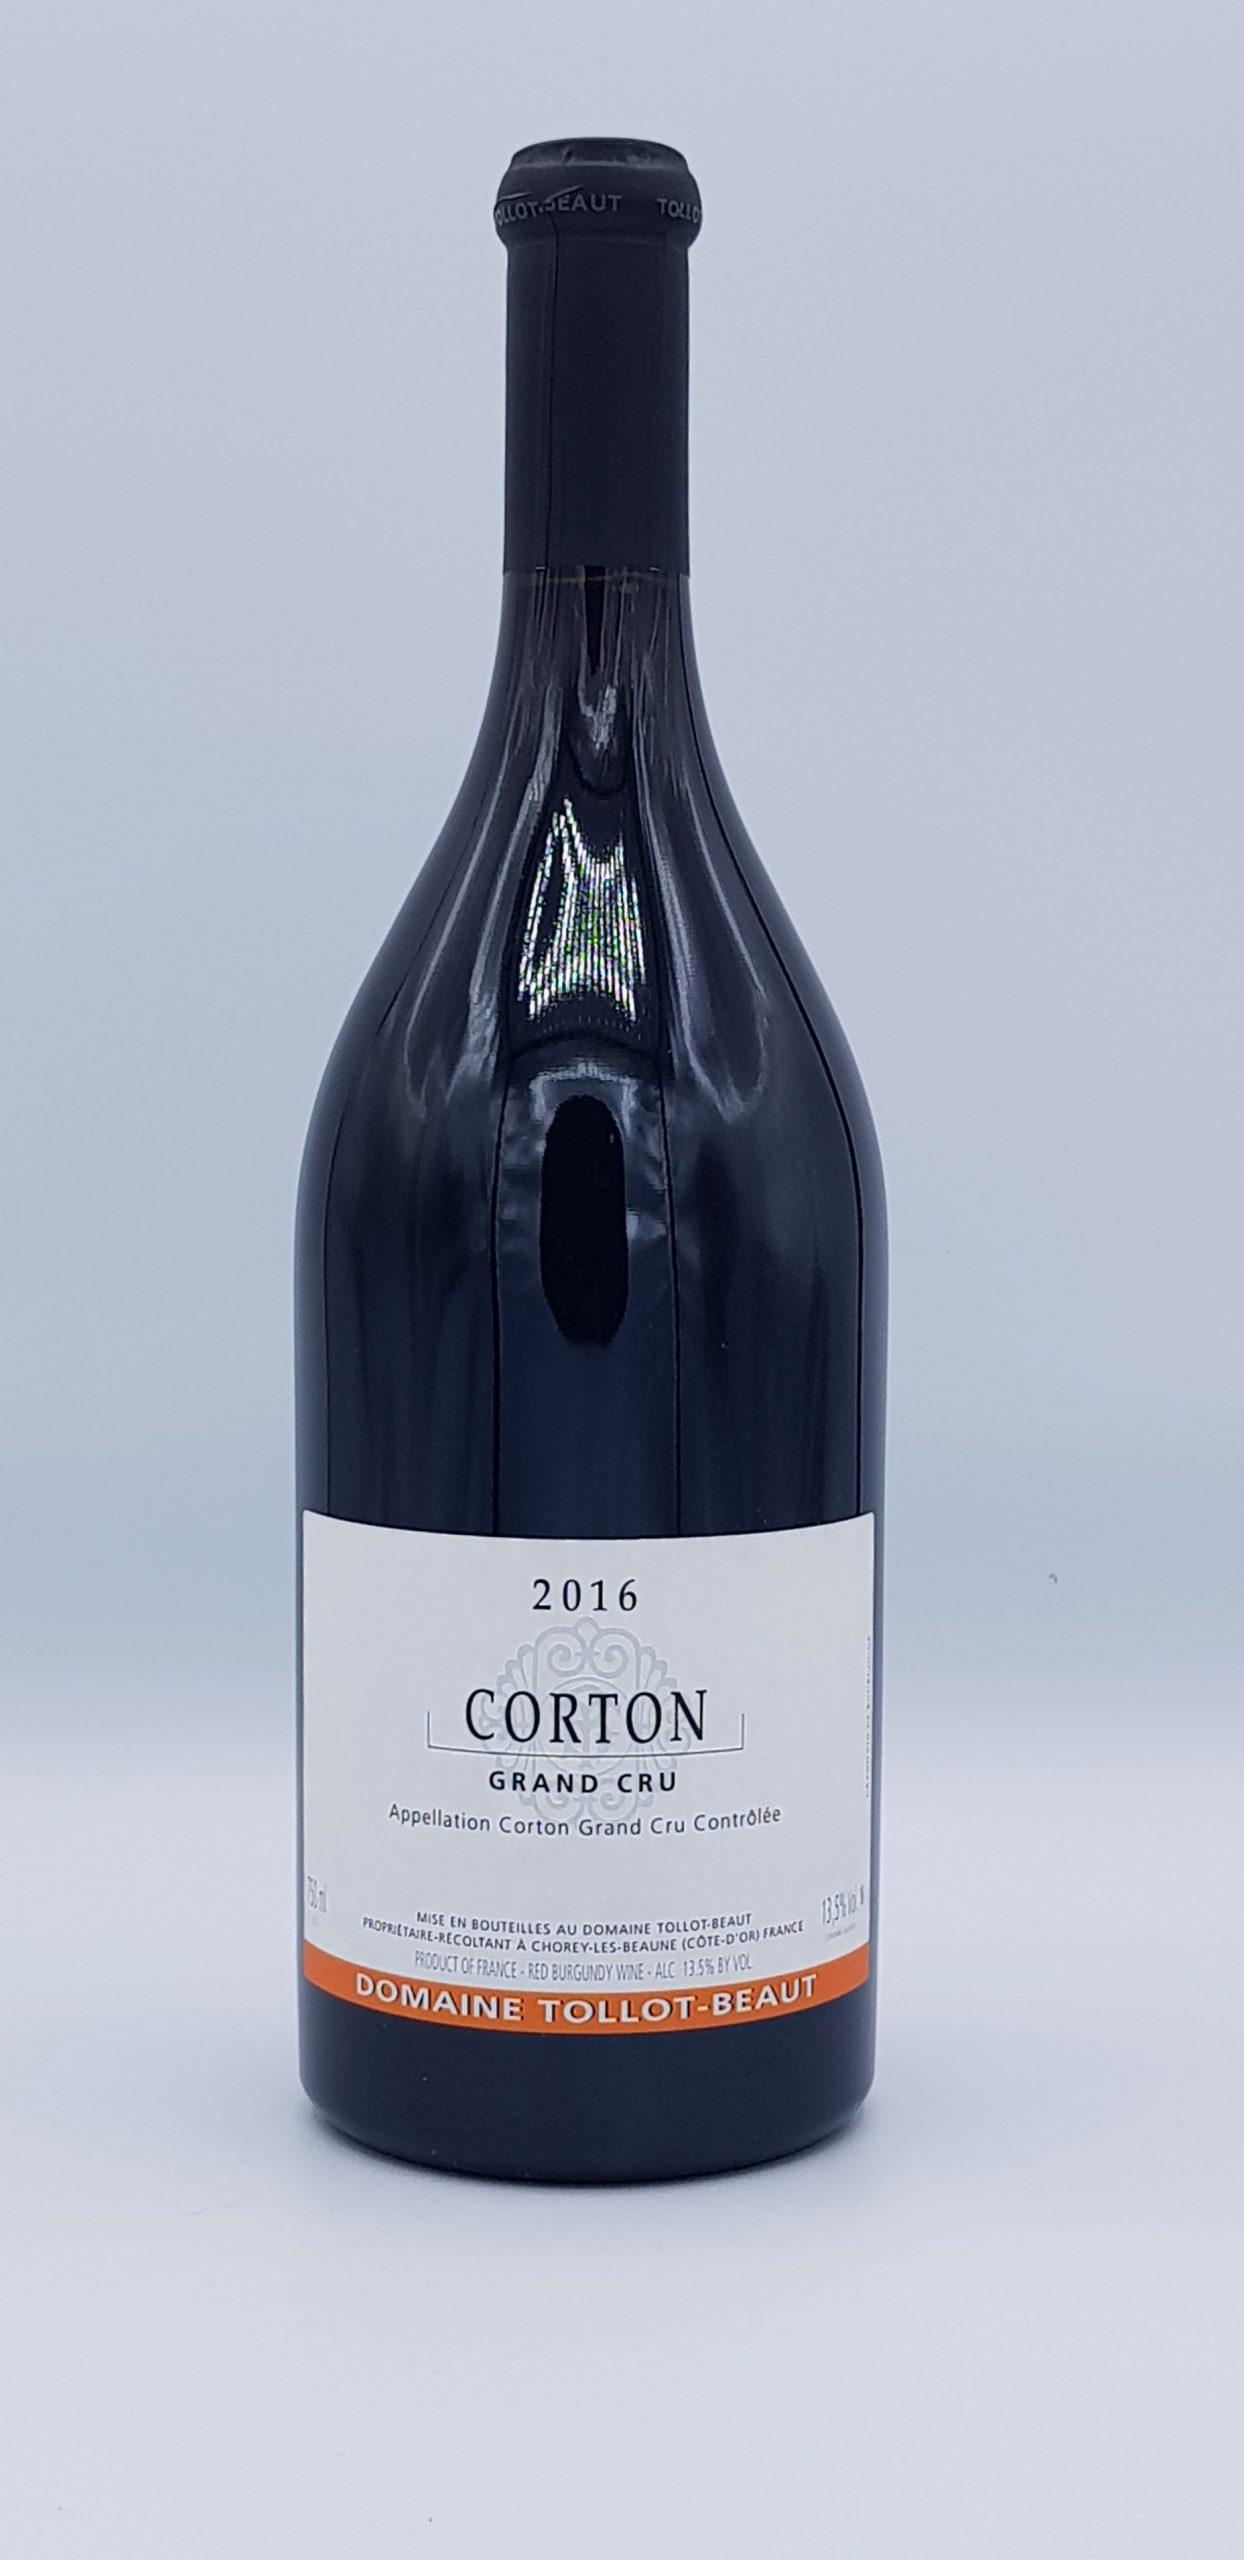 Corton Grand Cru 2016 Dom Tollot Beaut